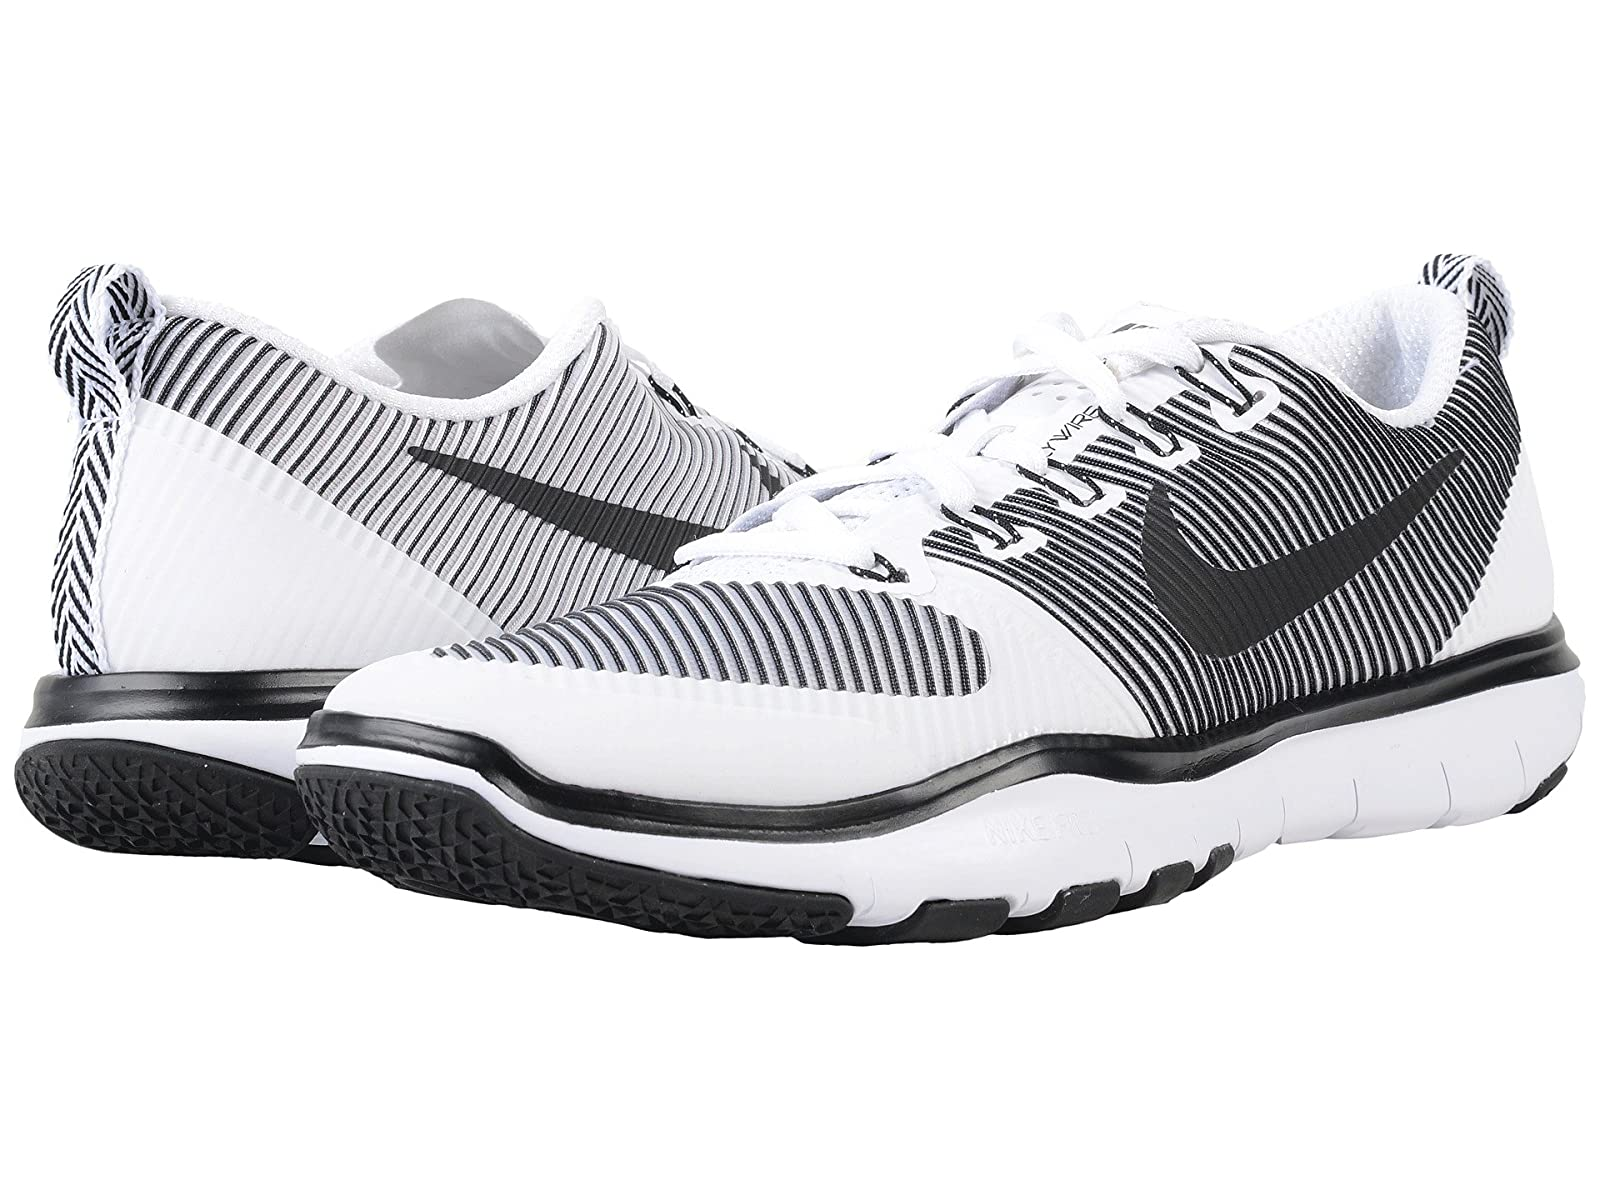 Men's/Women's-Nike Free Train Versatility -Online -Online -Online ec30fc